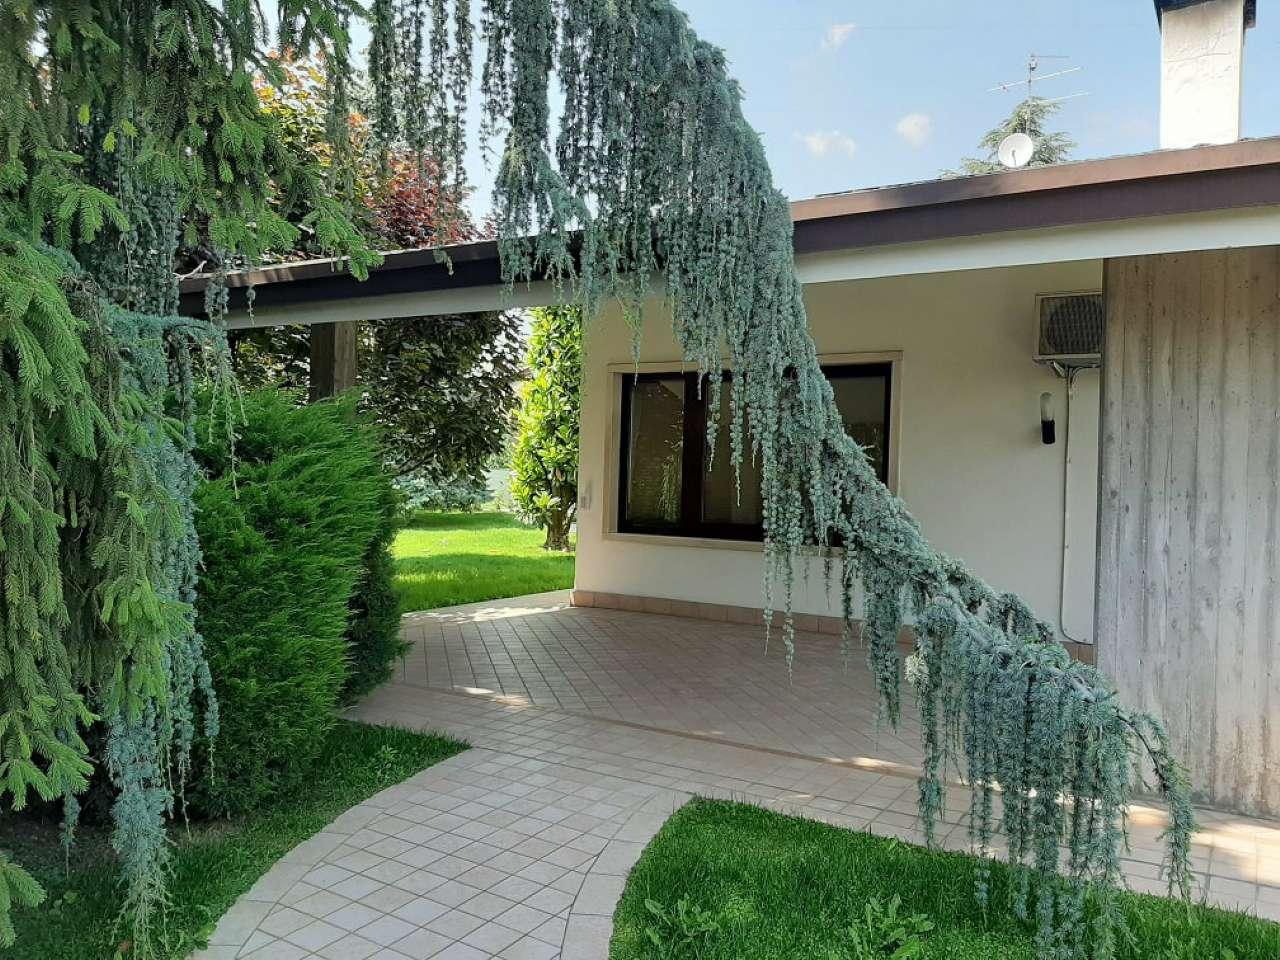 Bussolengo - Villa con giardino, foto 18